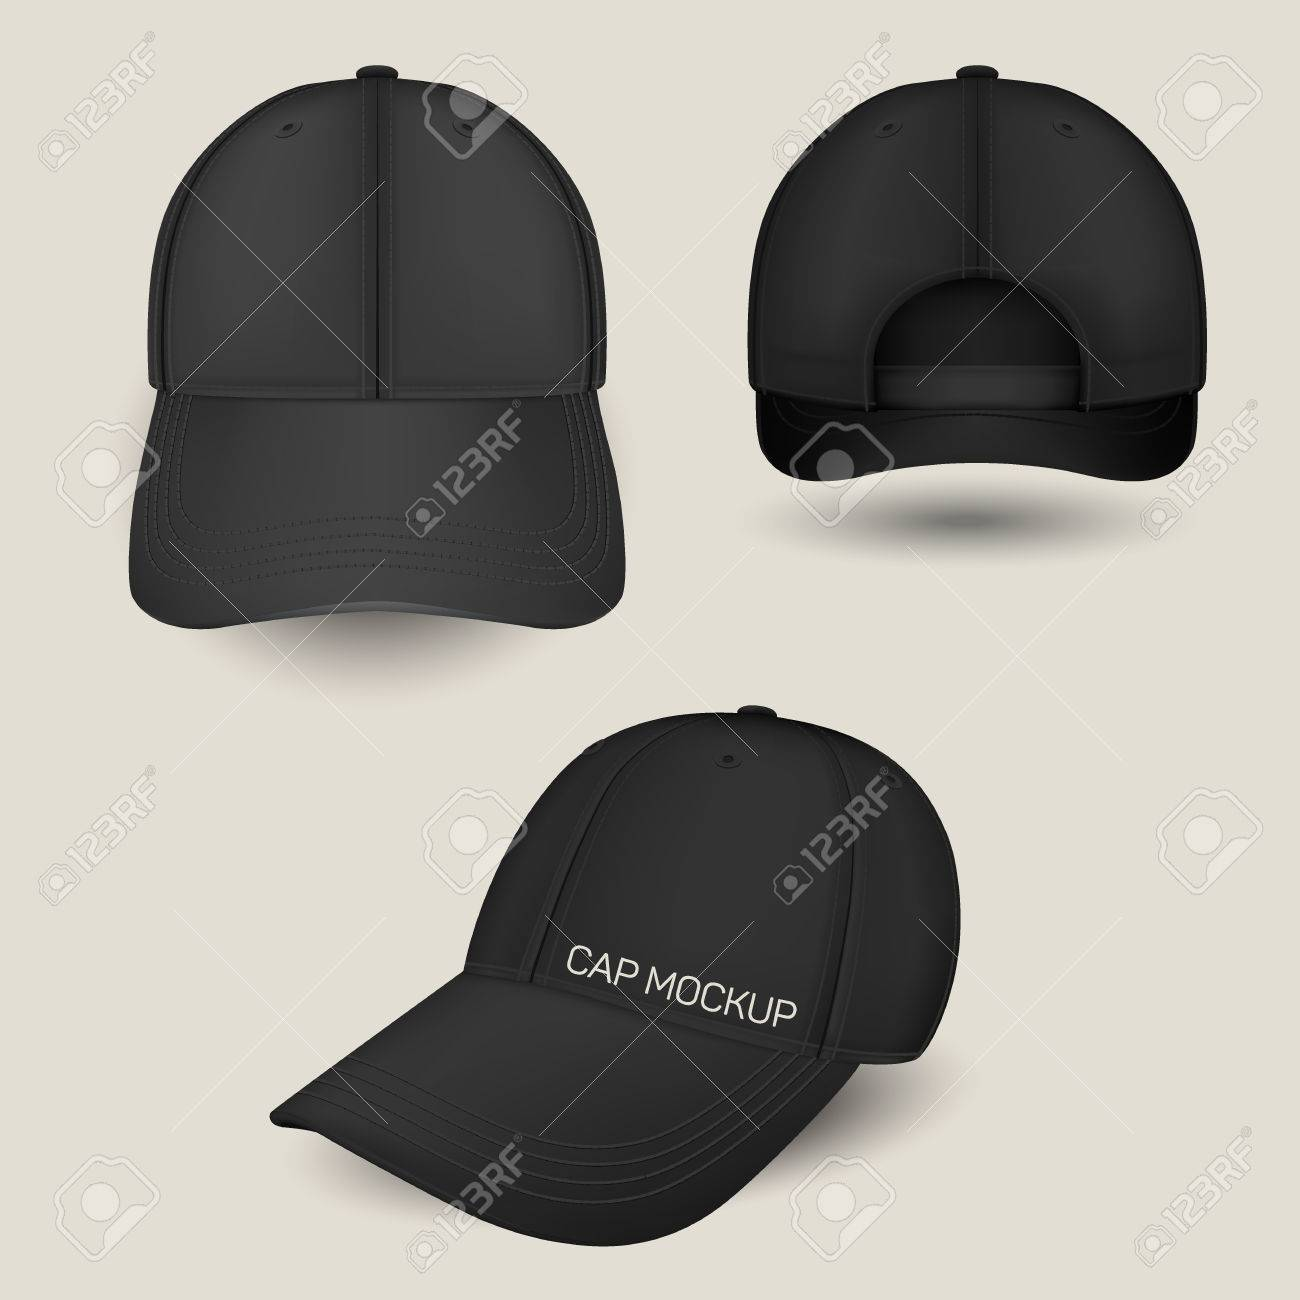 Black Caps Mockup In Front 4fa31c23b0b